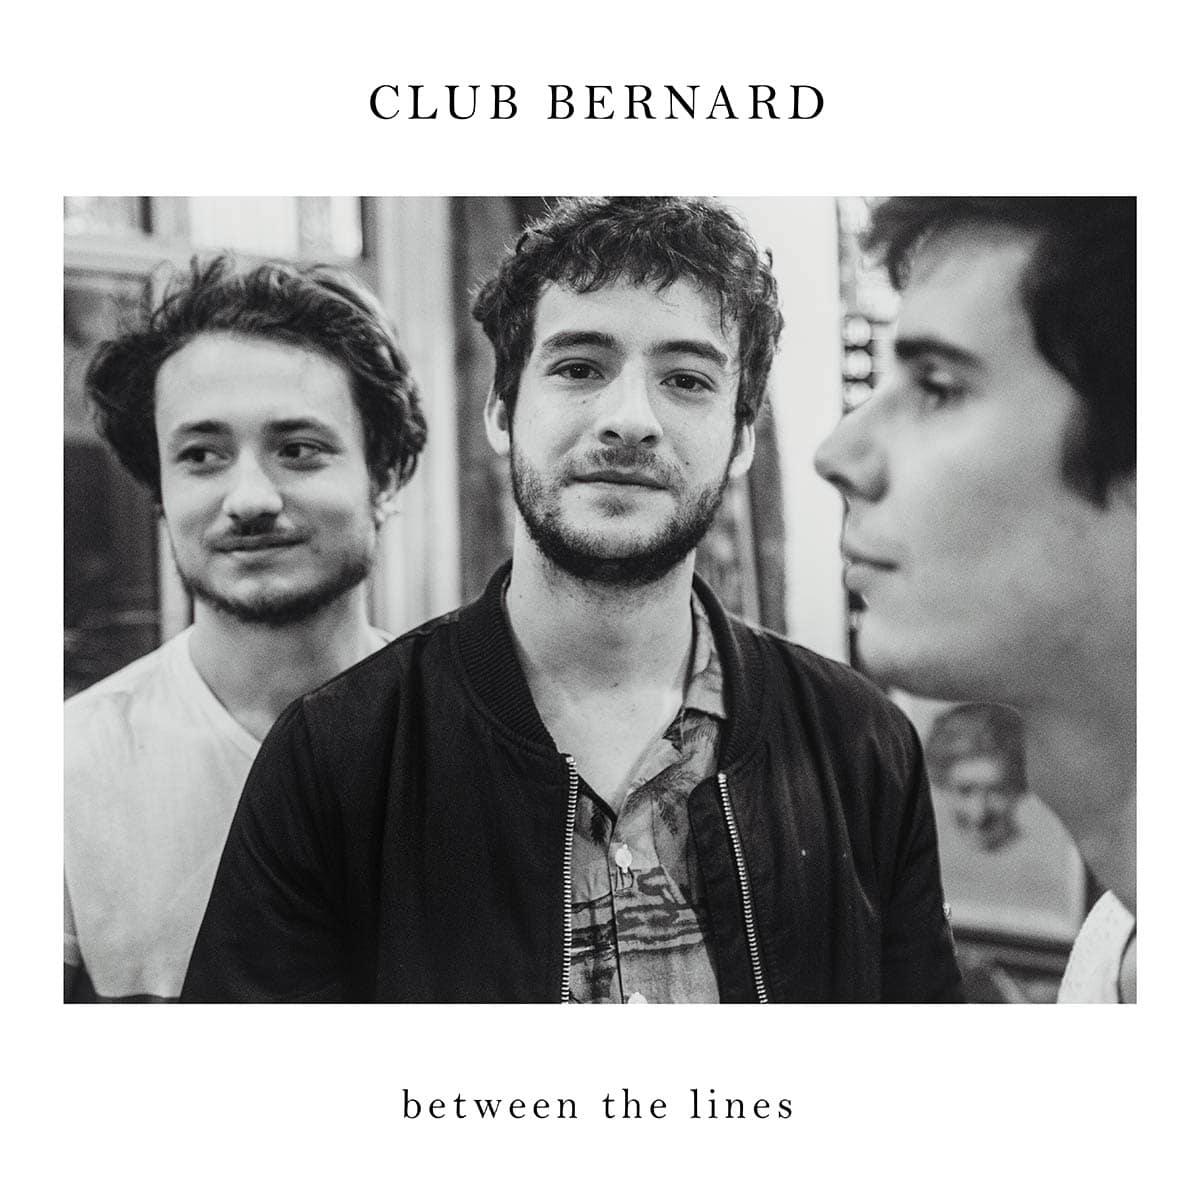 Cover album pochette club bernard between the lines